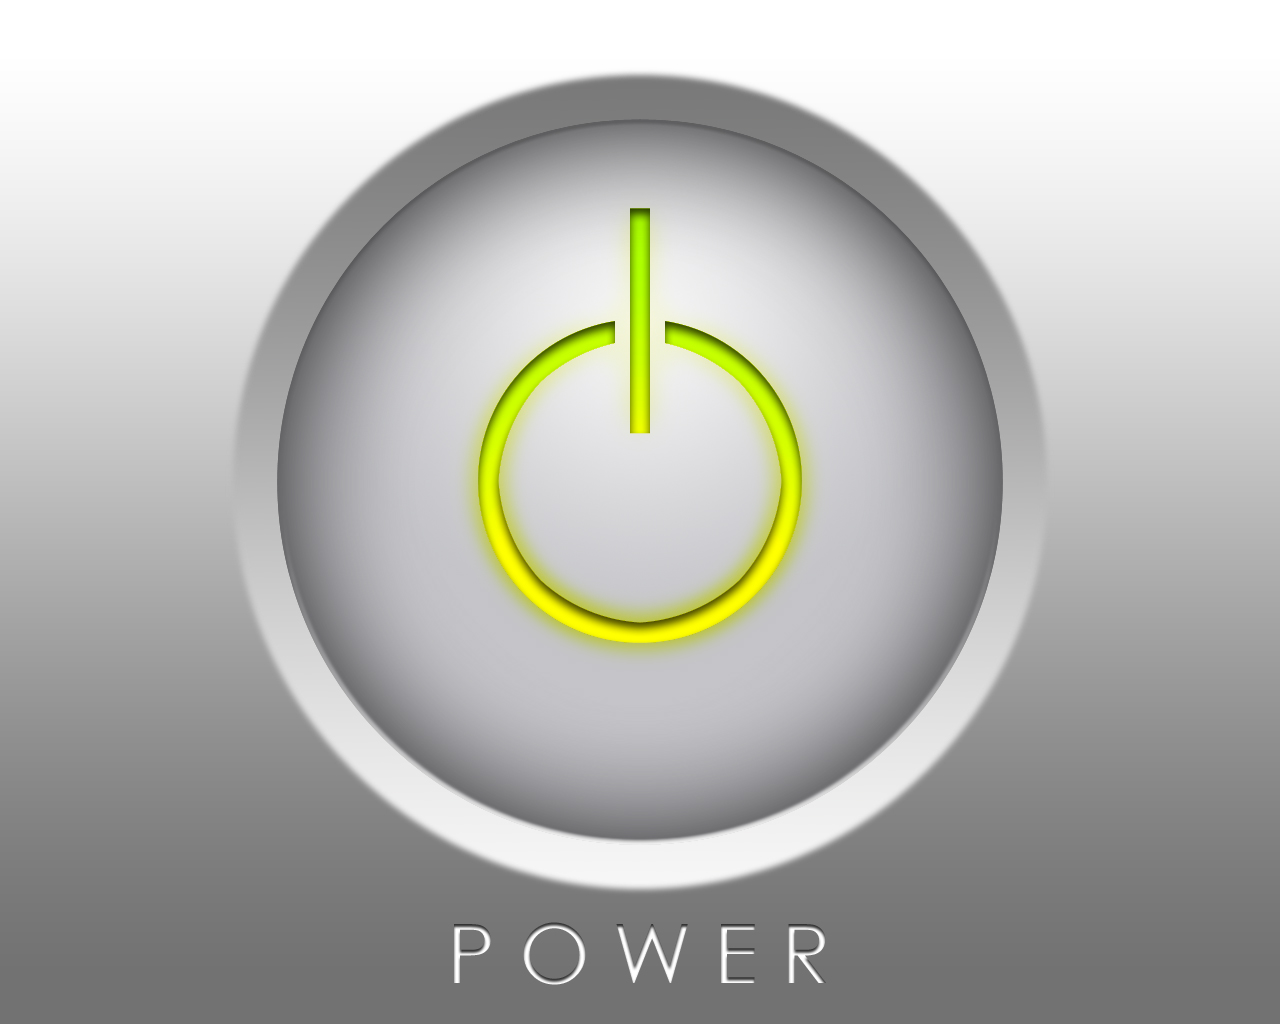 power - 1024×630